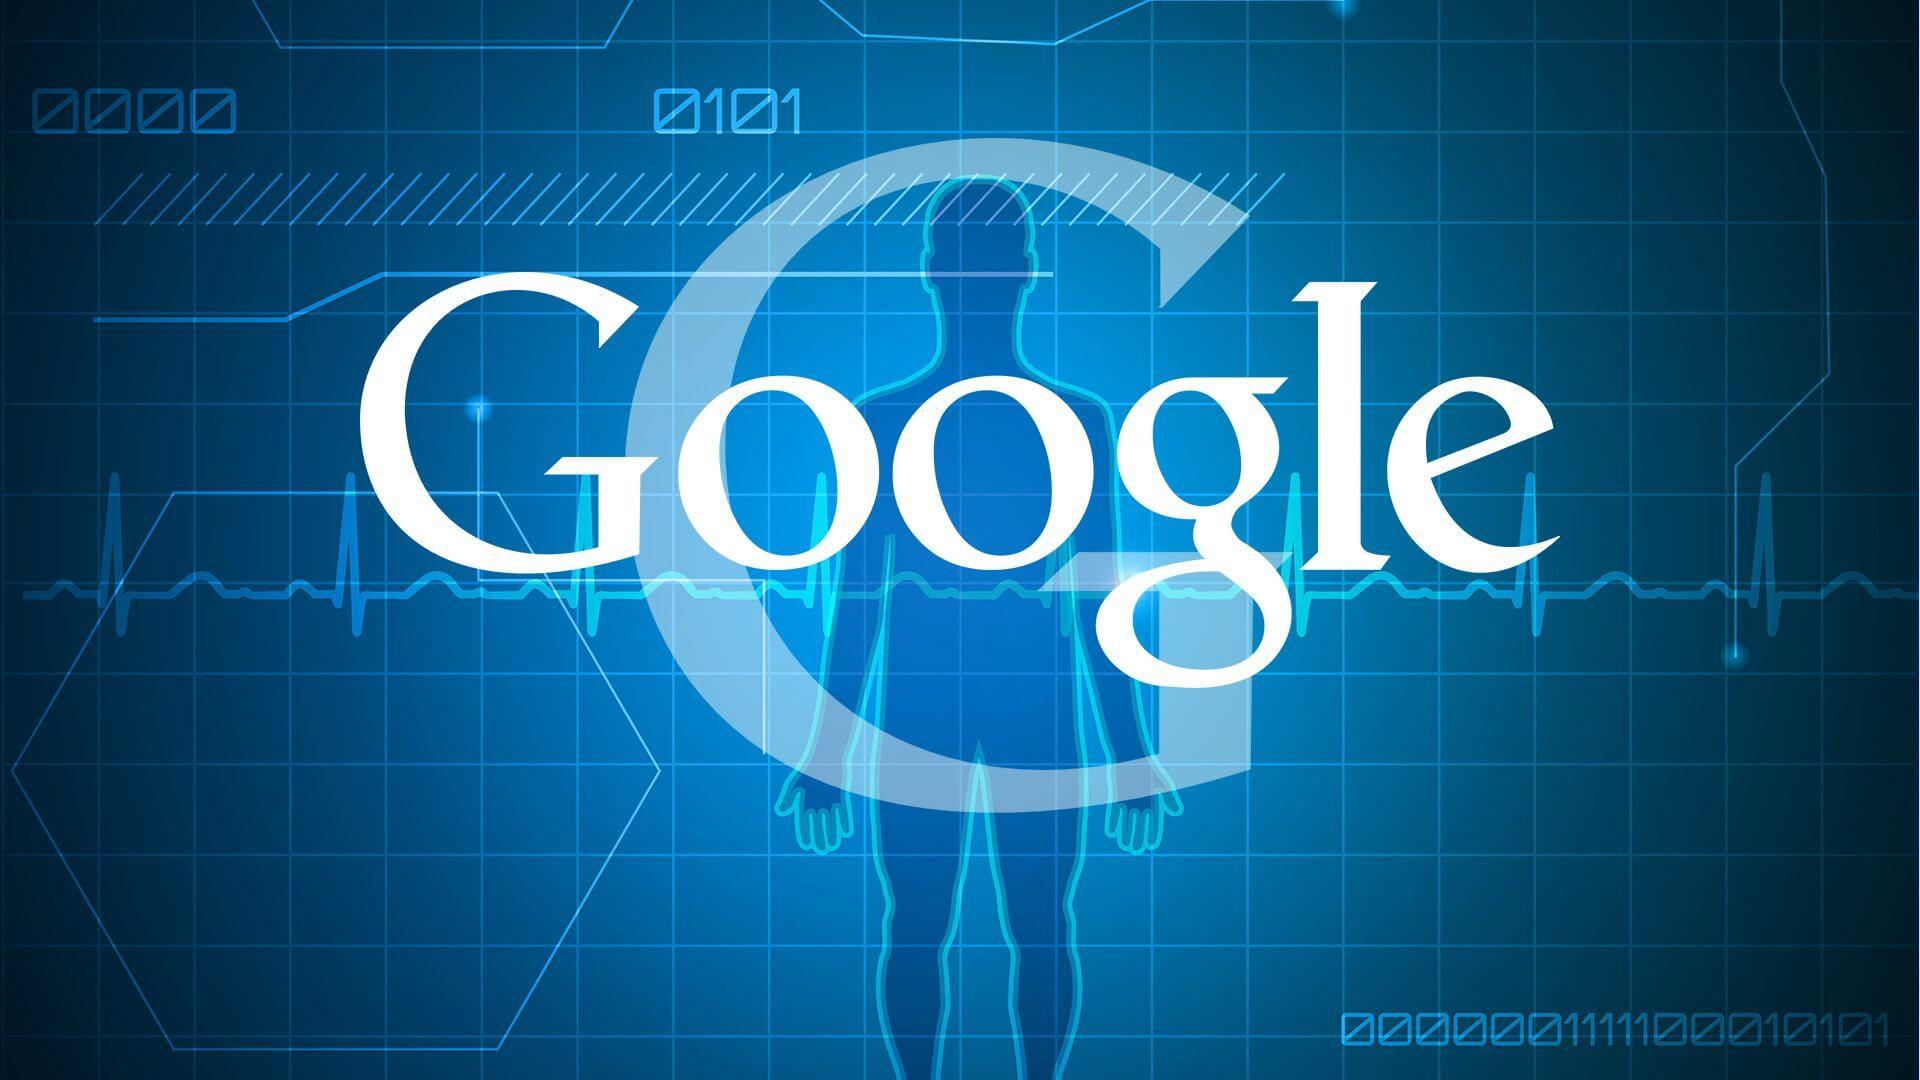 google health6 ss 1920